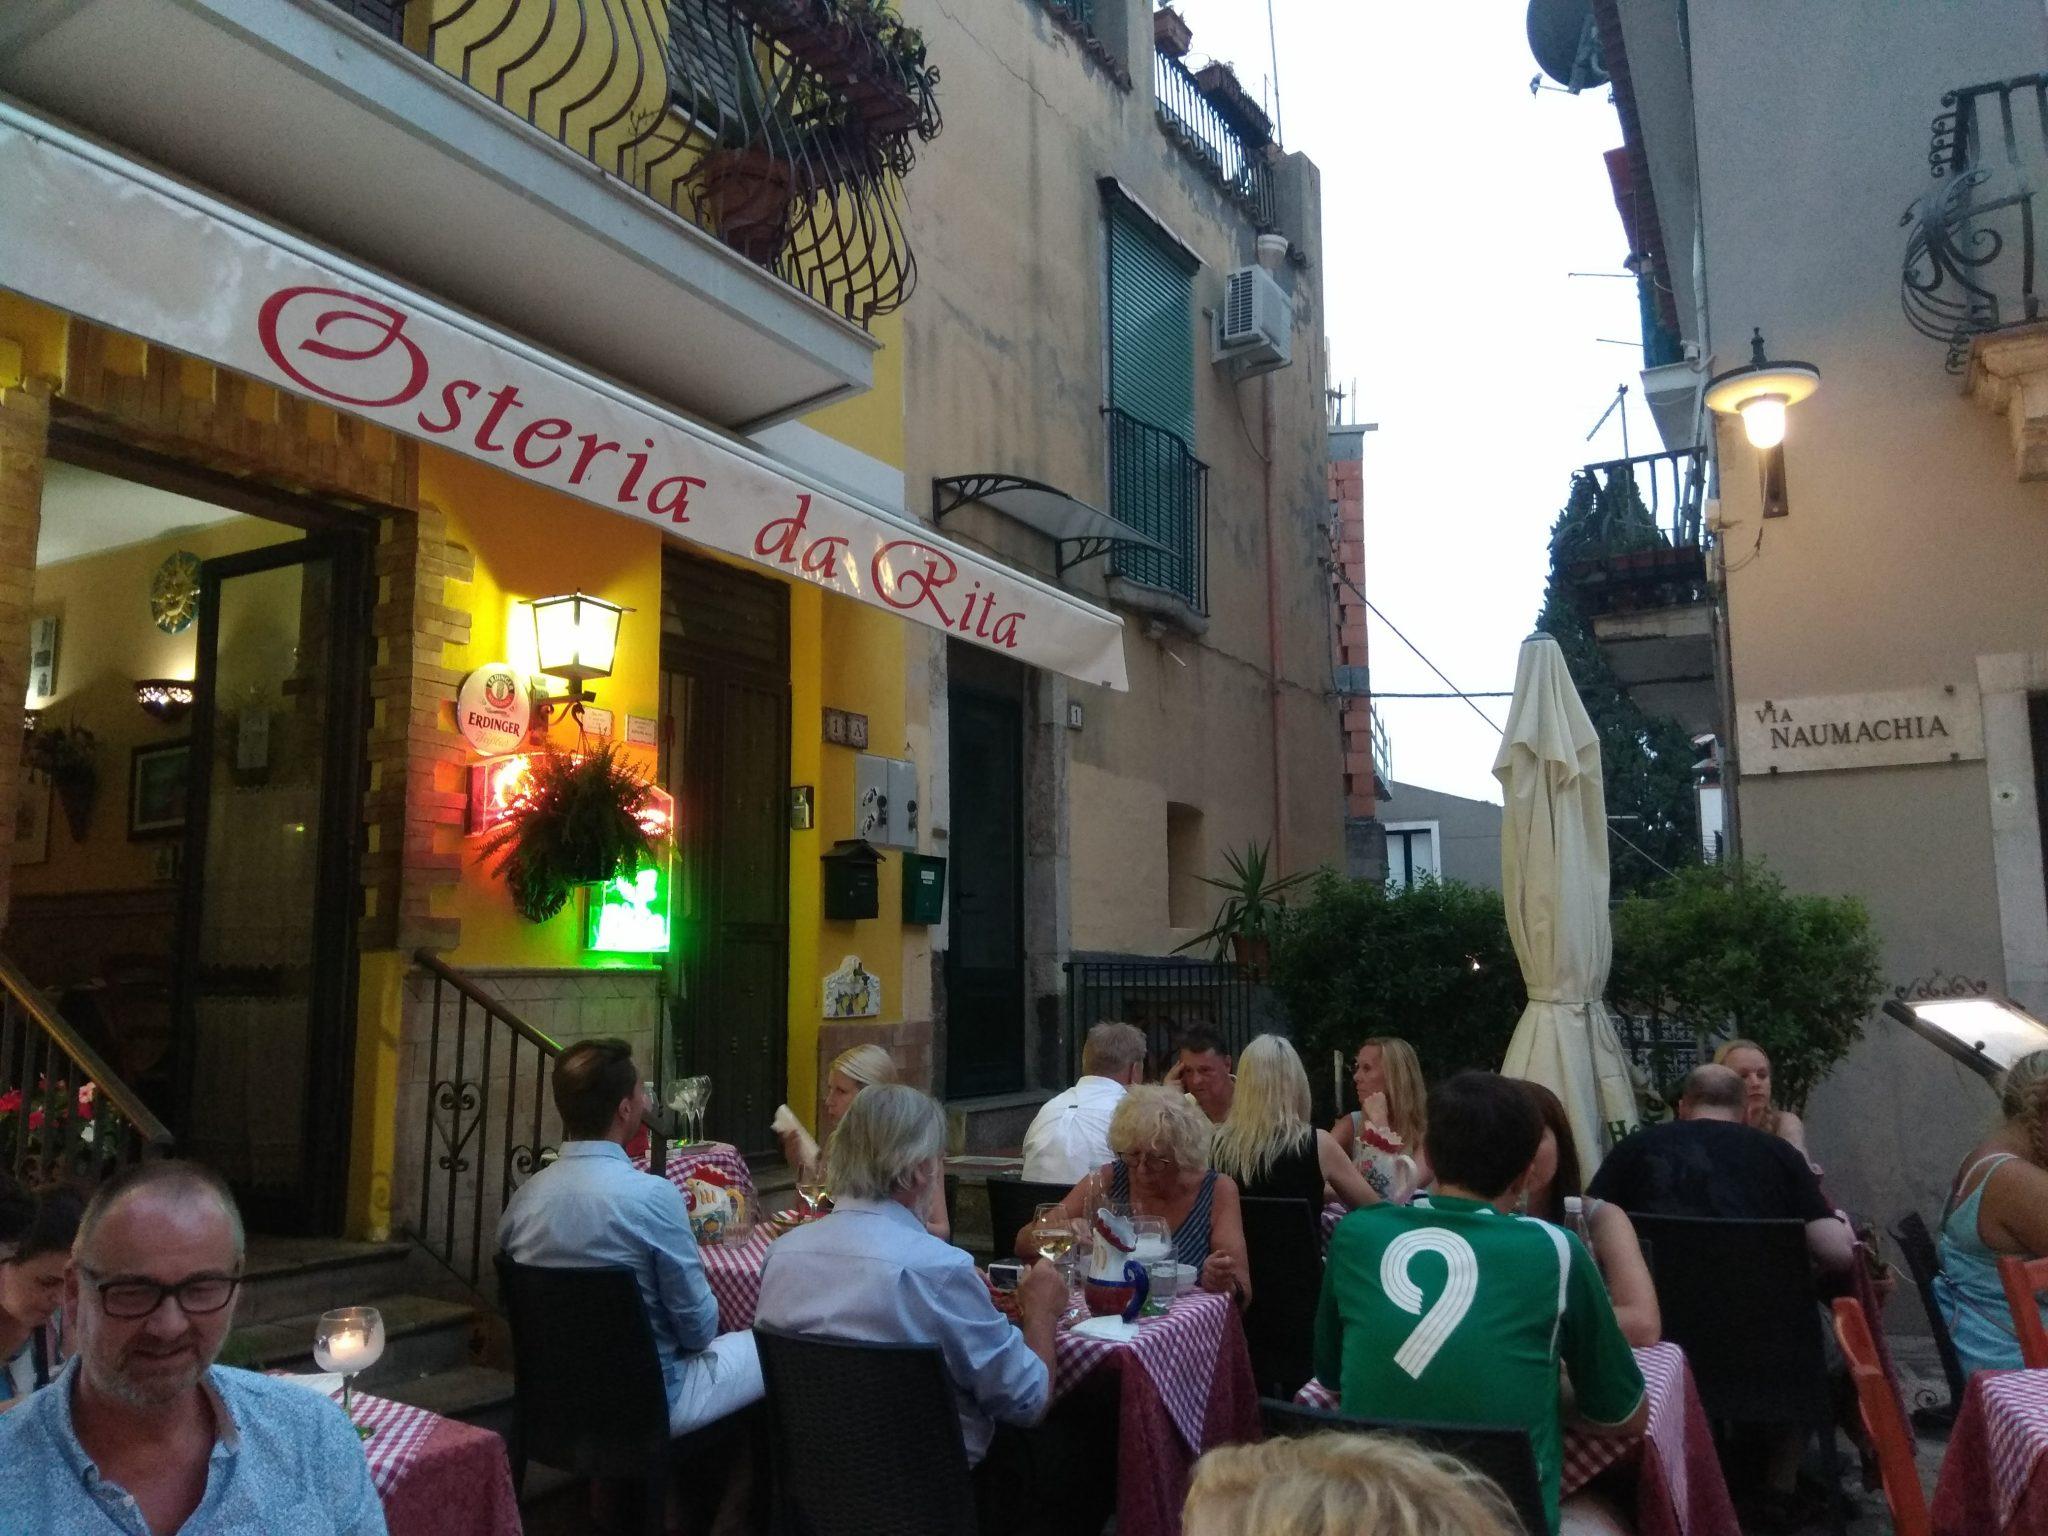 Img post Osteria da Rita. Comer en Taormina - Pasaporte y Millas